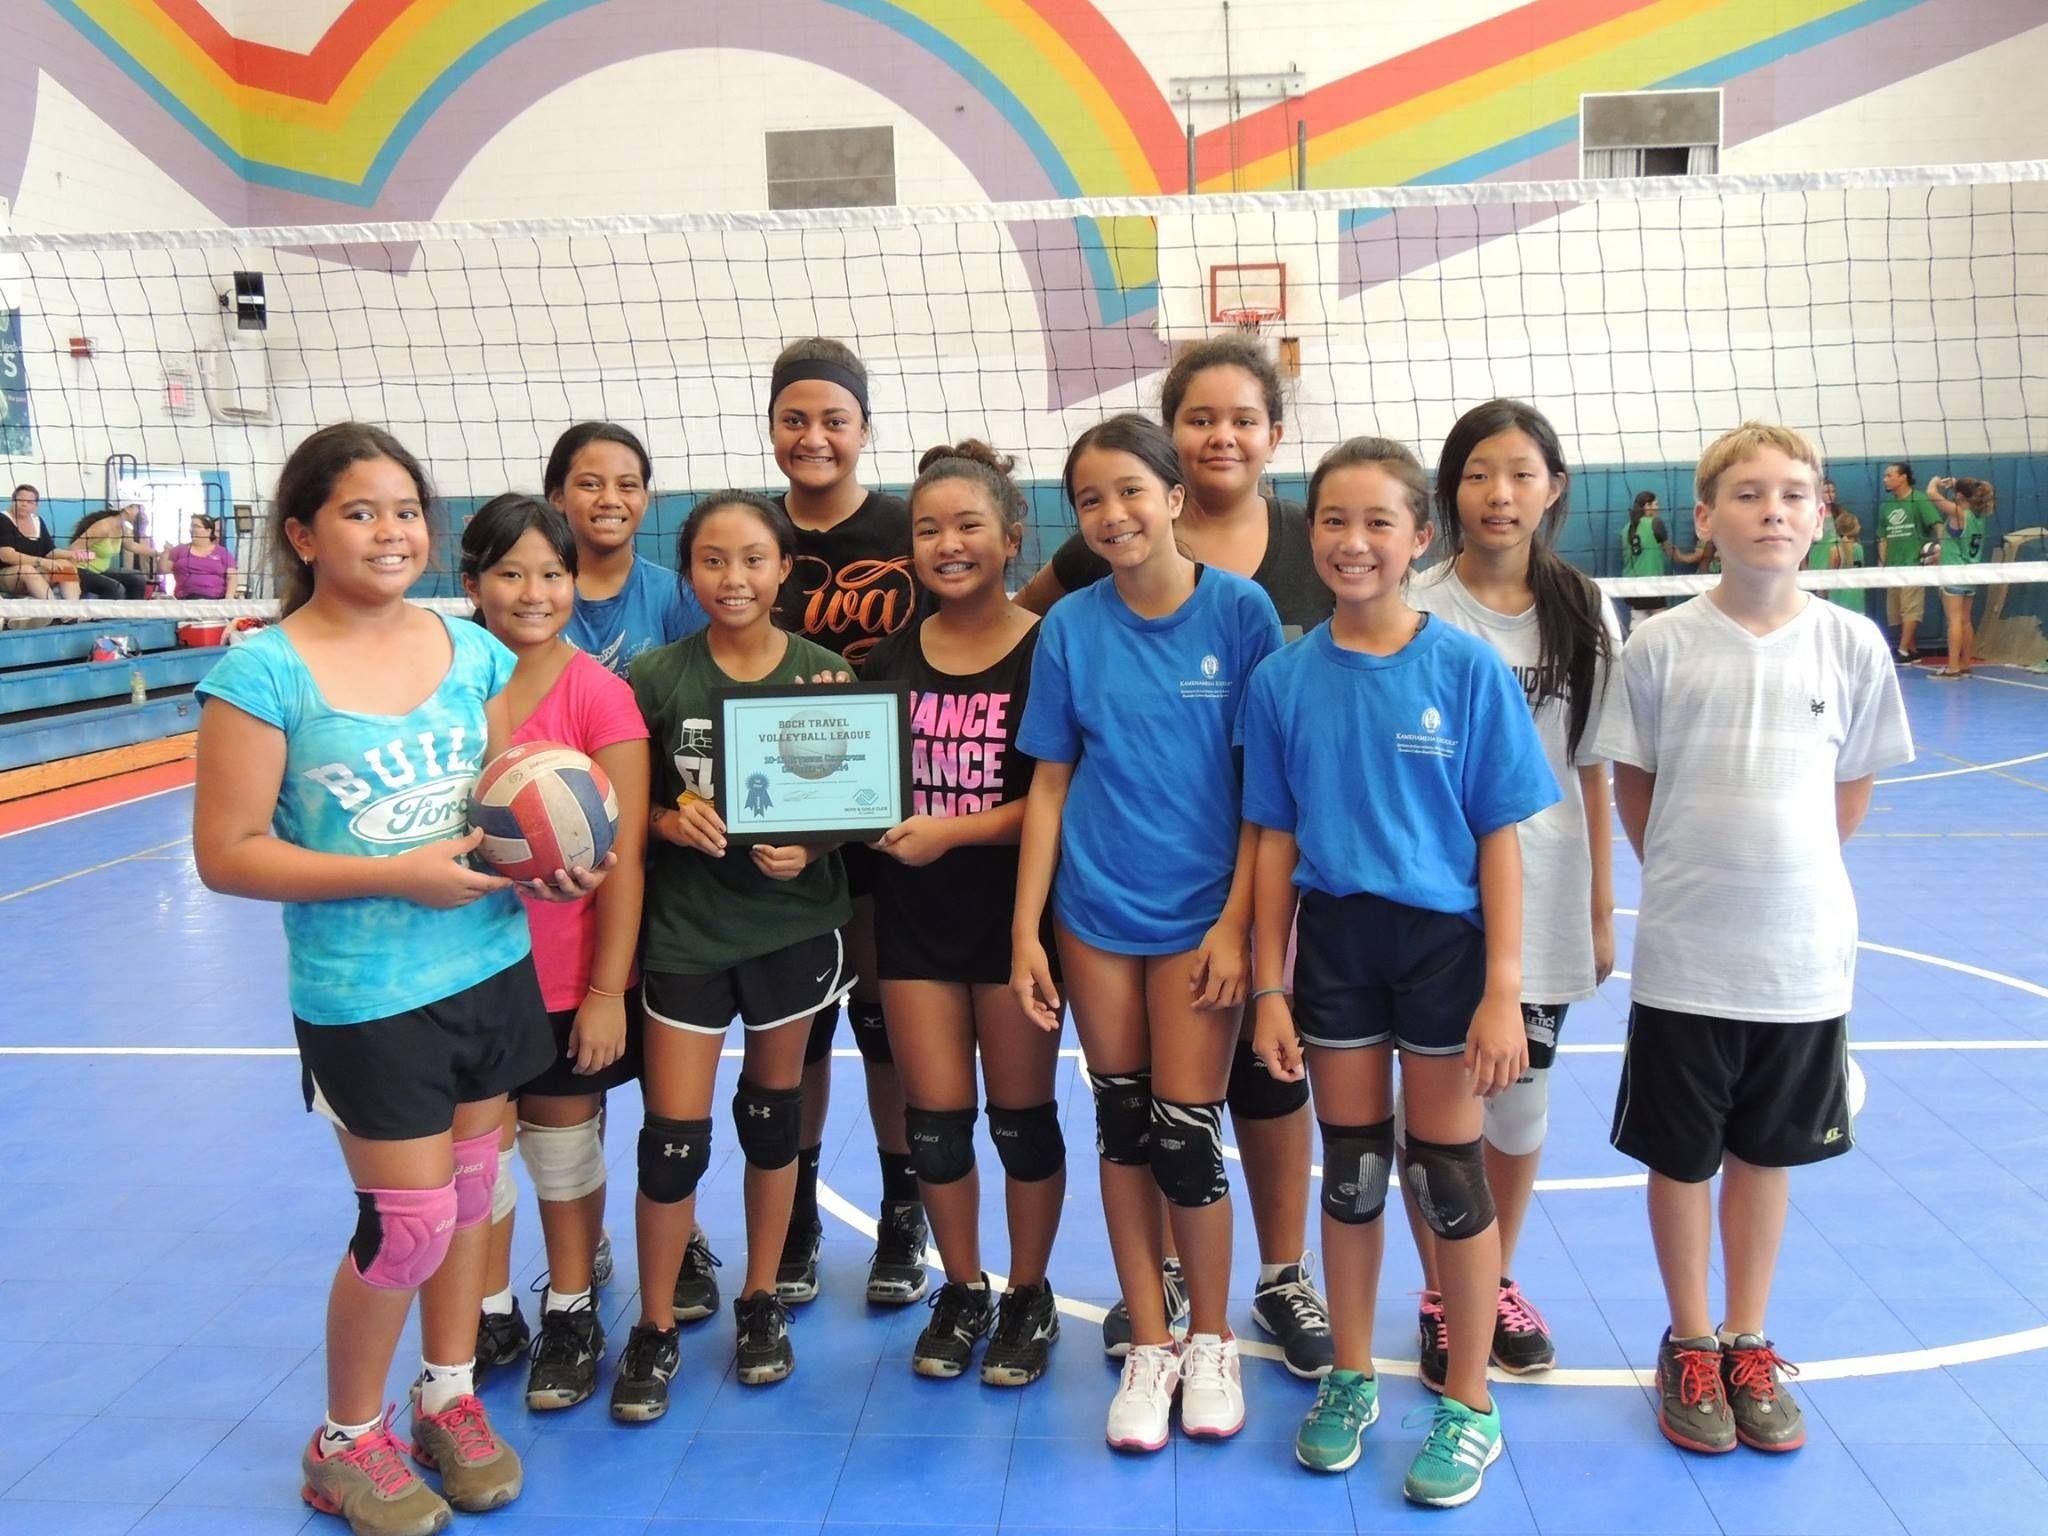 12u Team Volleyball Clubs Volleyball Basketball Court